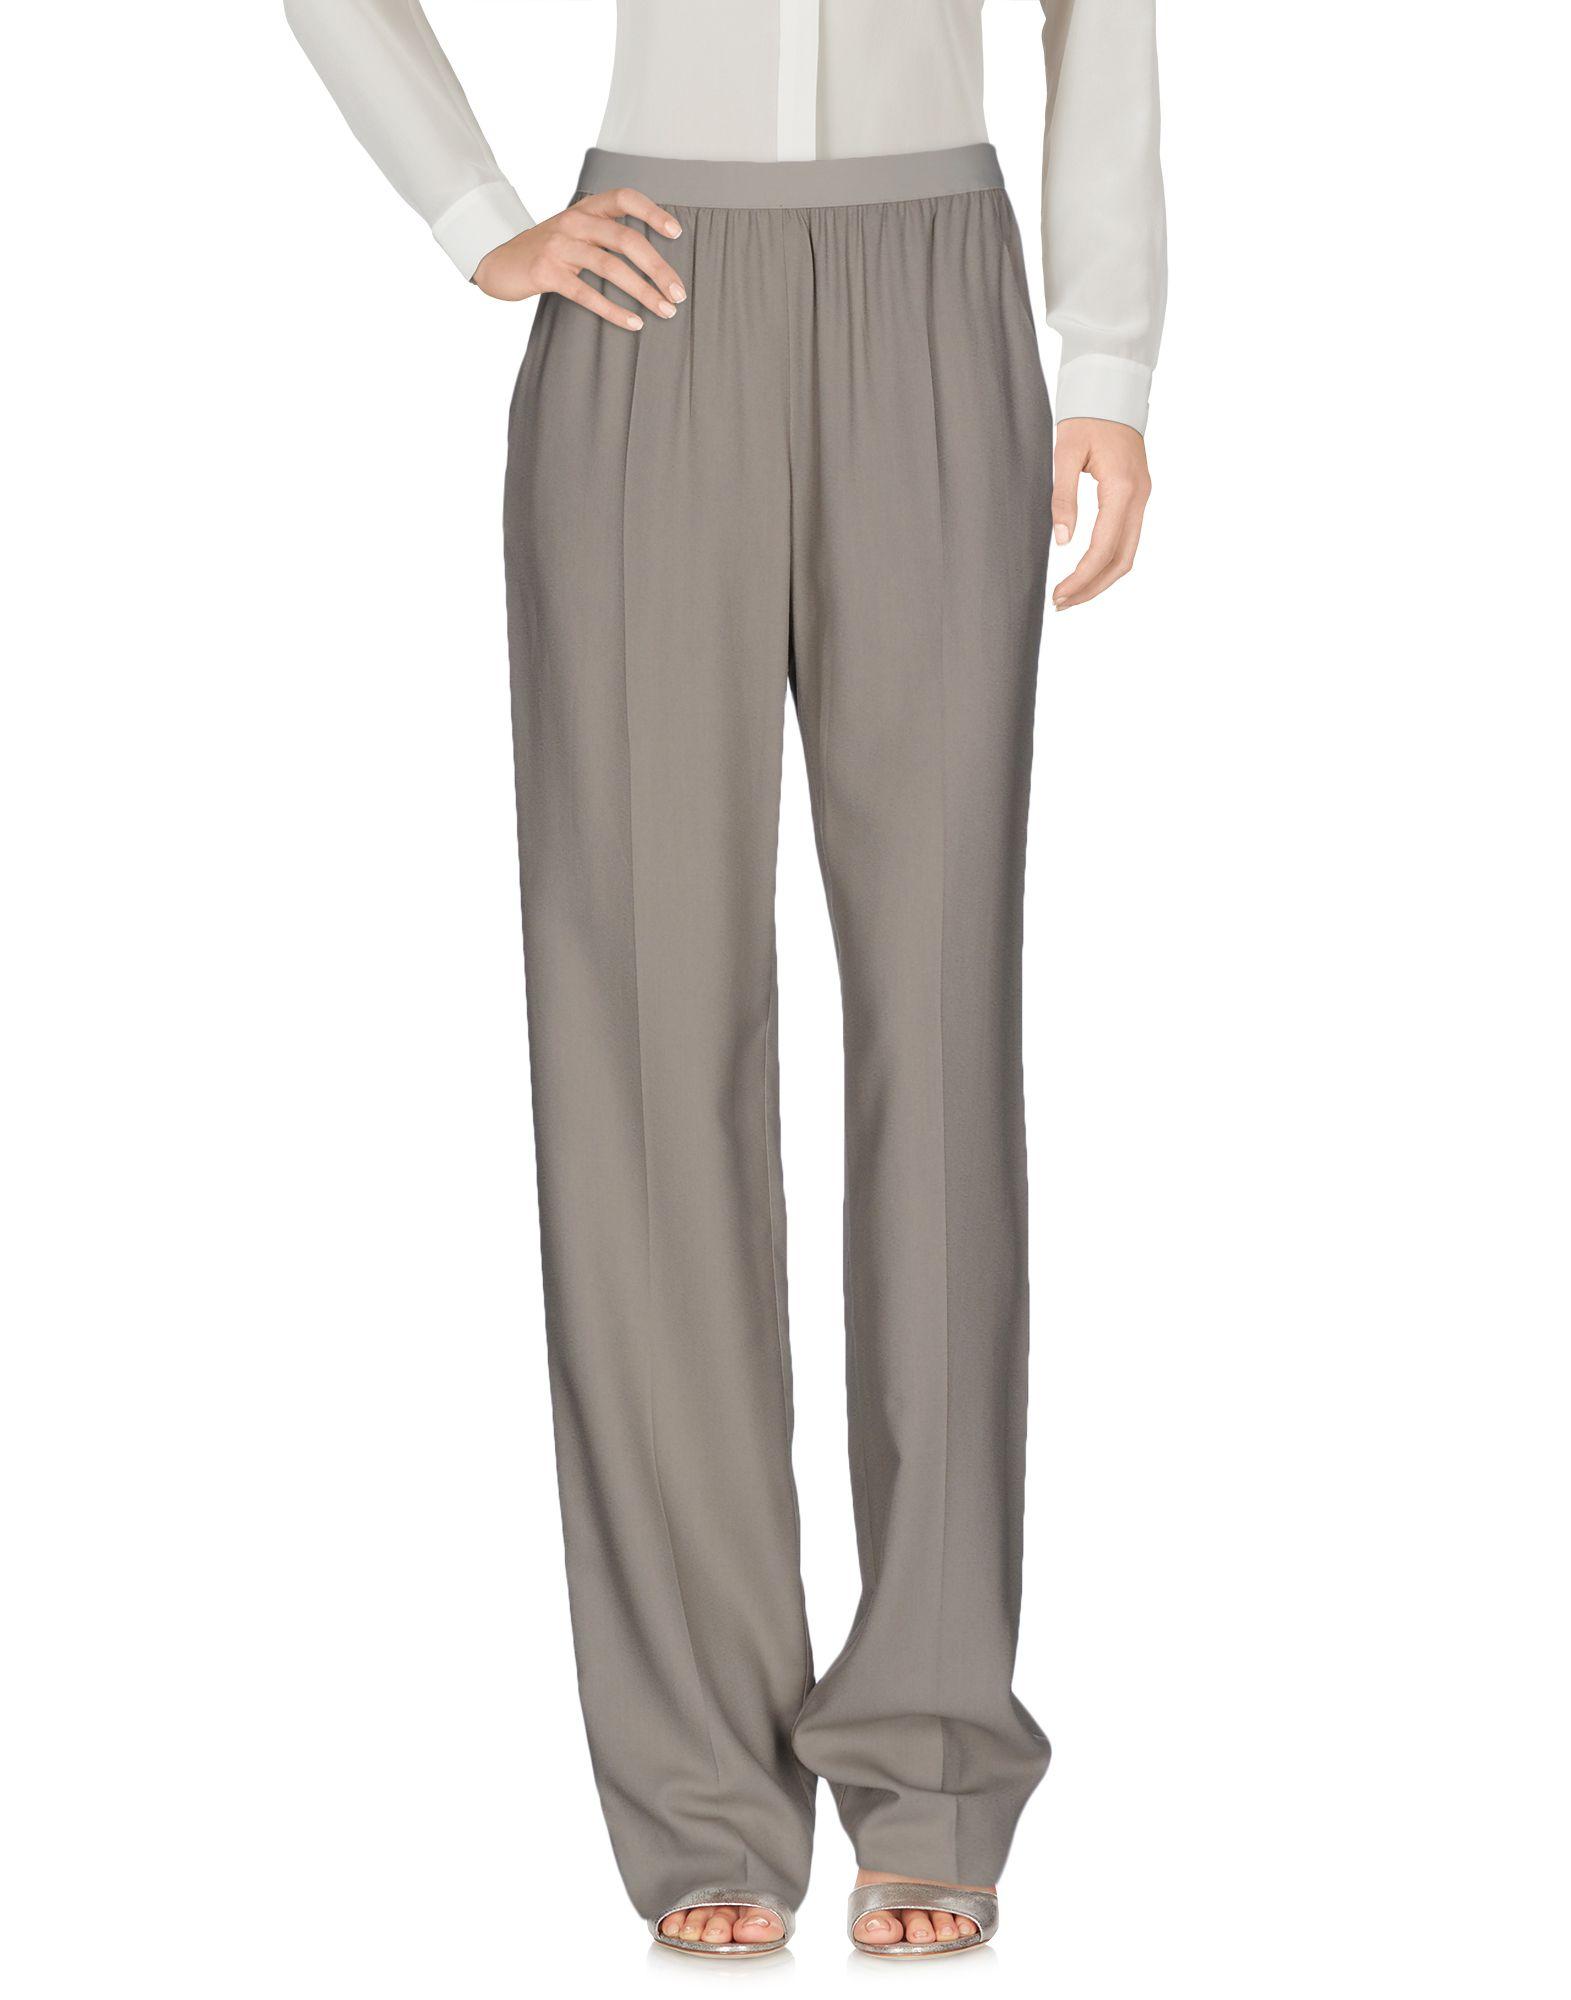 MAISON MARGIELA Повседневные брюки повседневные брюки maison margiela mp514776